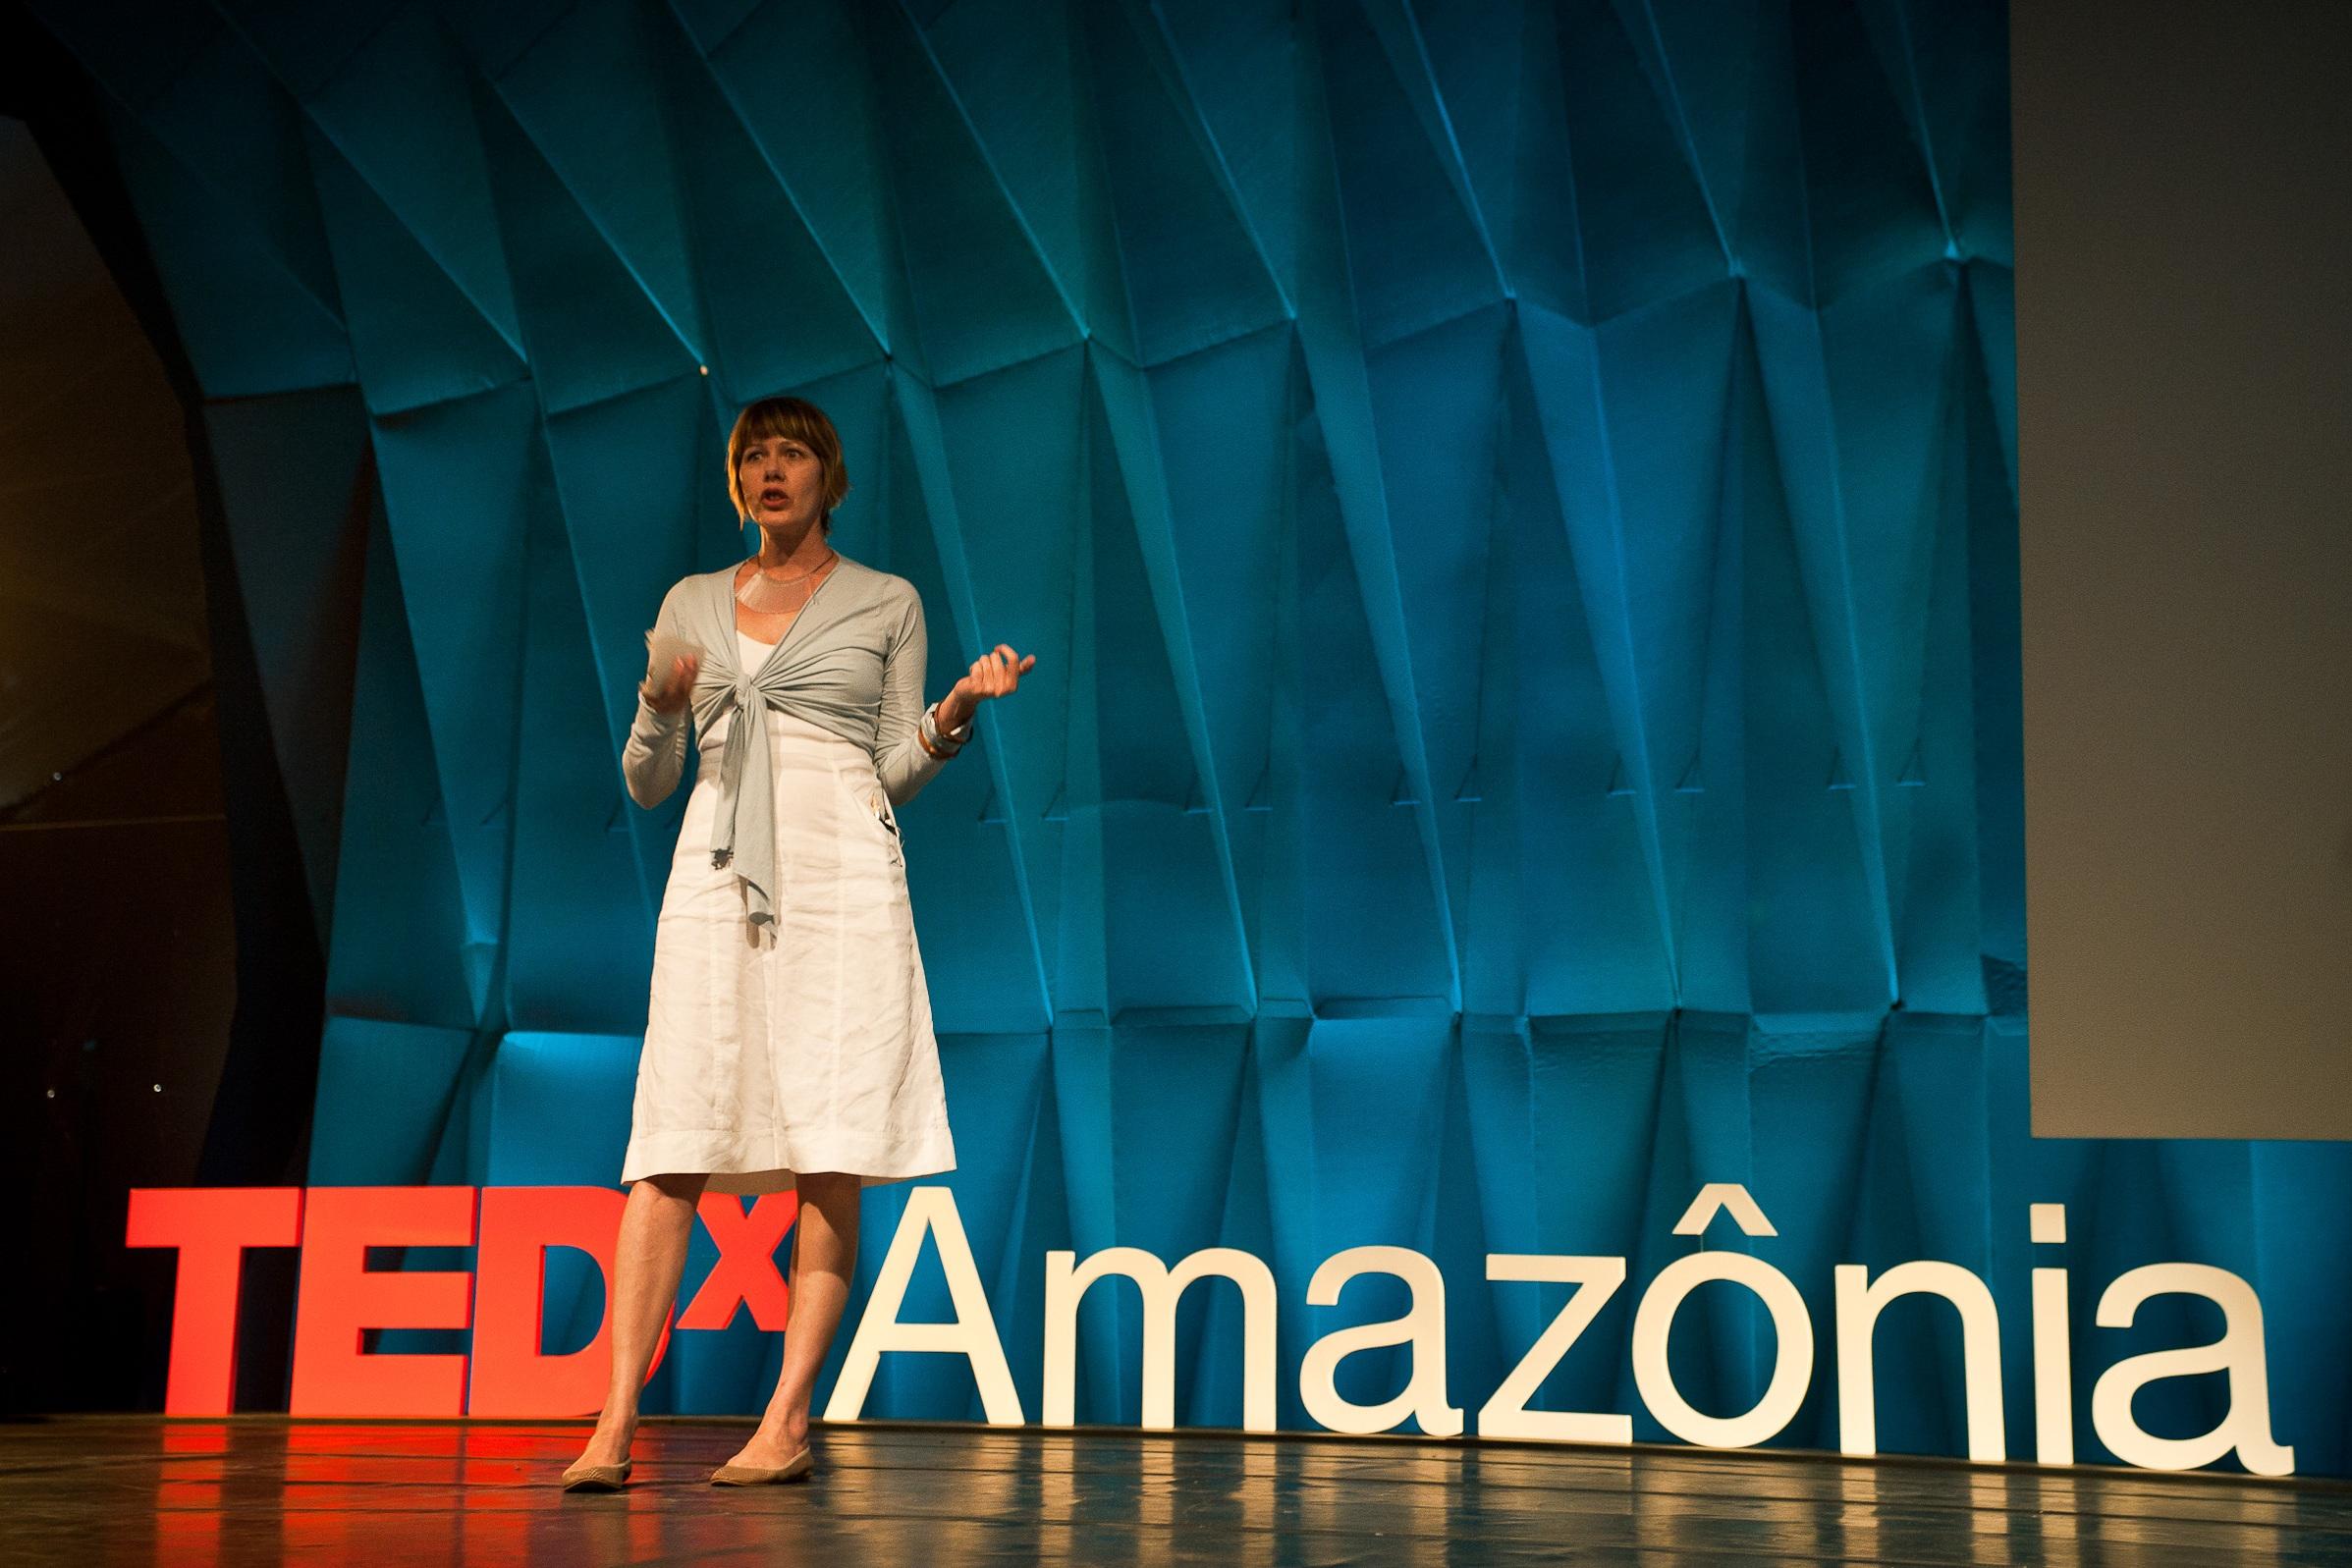 TEDxAmazonia - Amazonia, Brazil • 2010